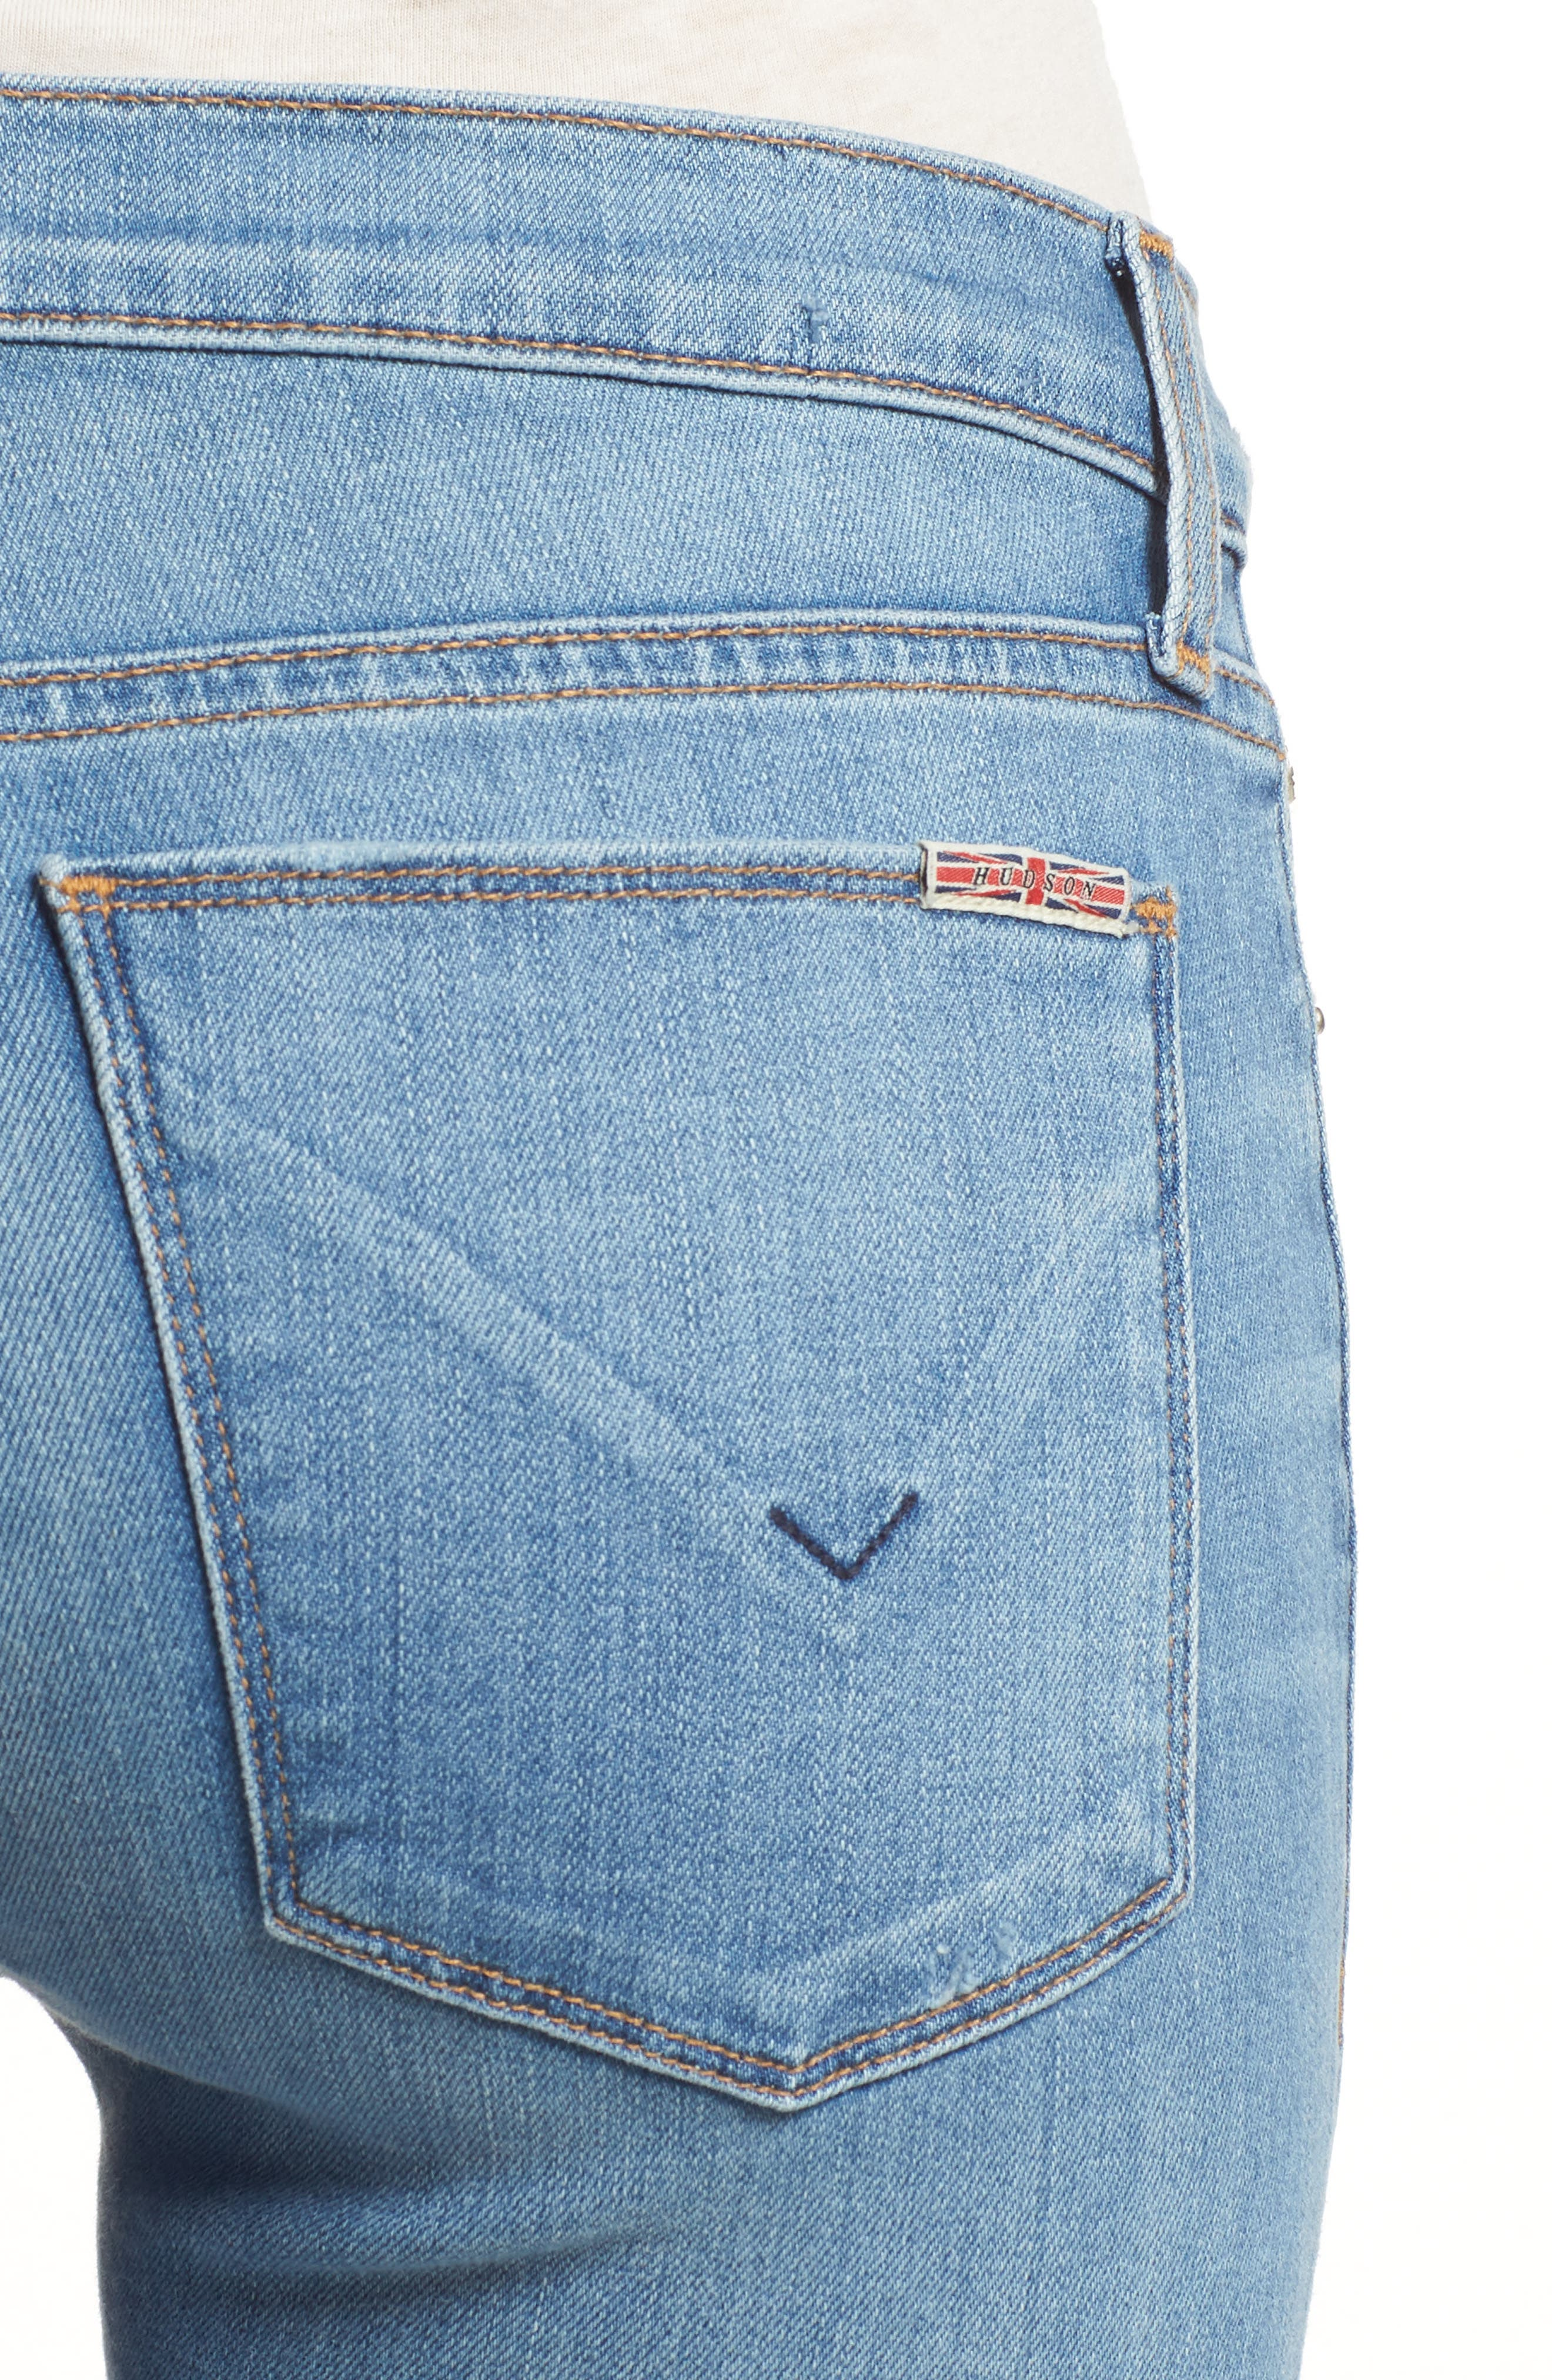 Krista Ankle Super Skinny Jeans,                             Alternate thumbnail 8, color,